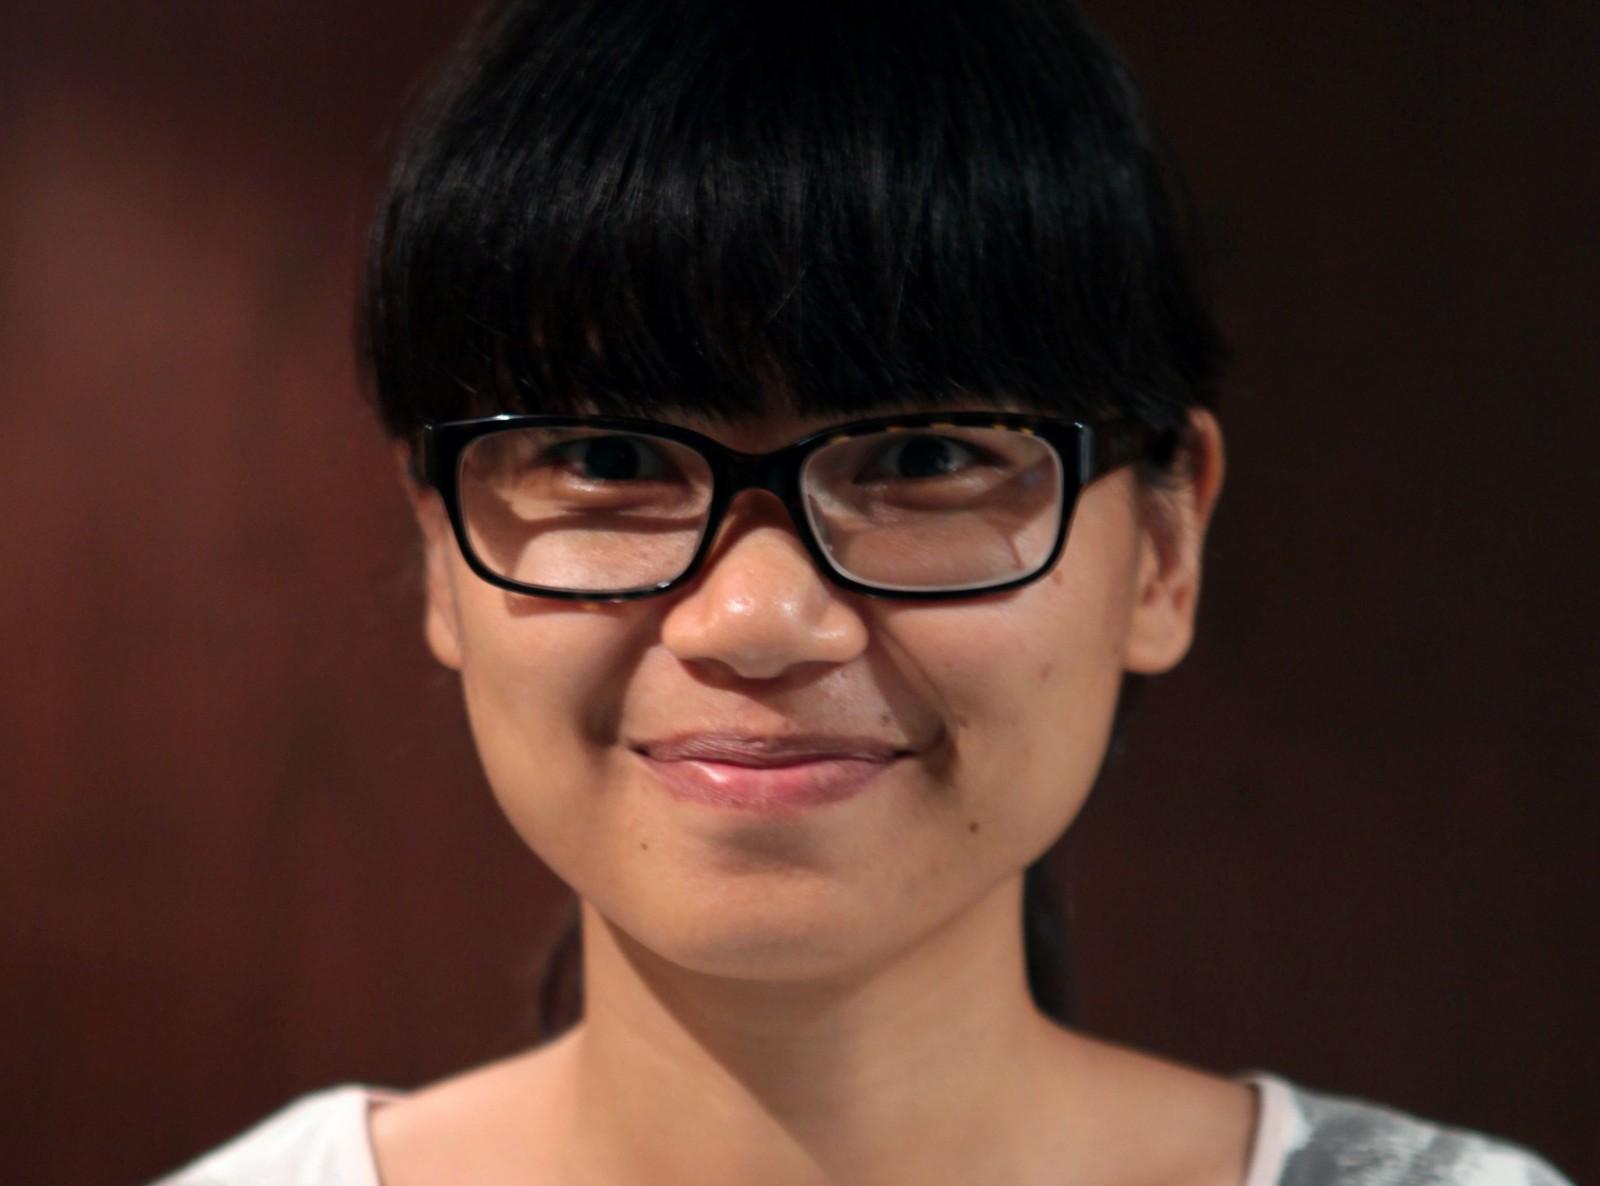 PAS Nantes 2013 - Maenum Chagasik (Thaïlande) -Producteur - BEER GIRL